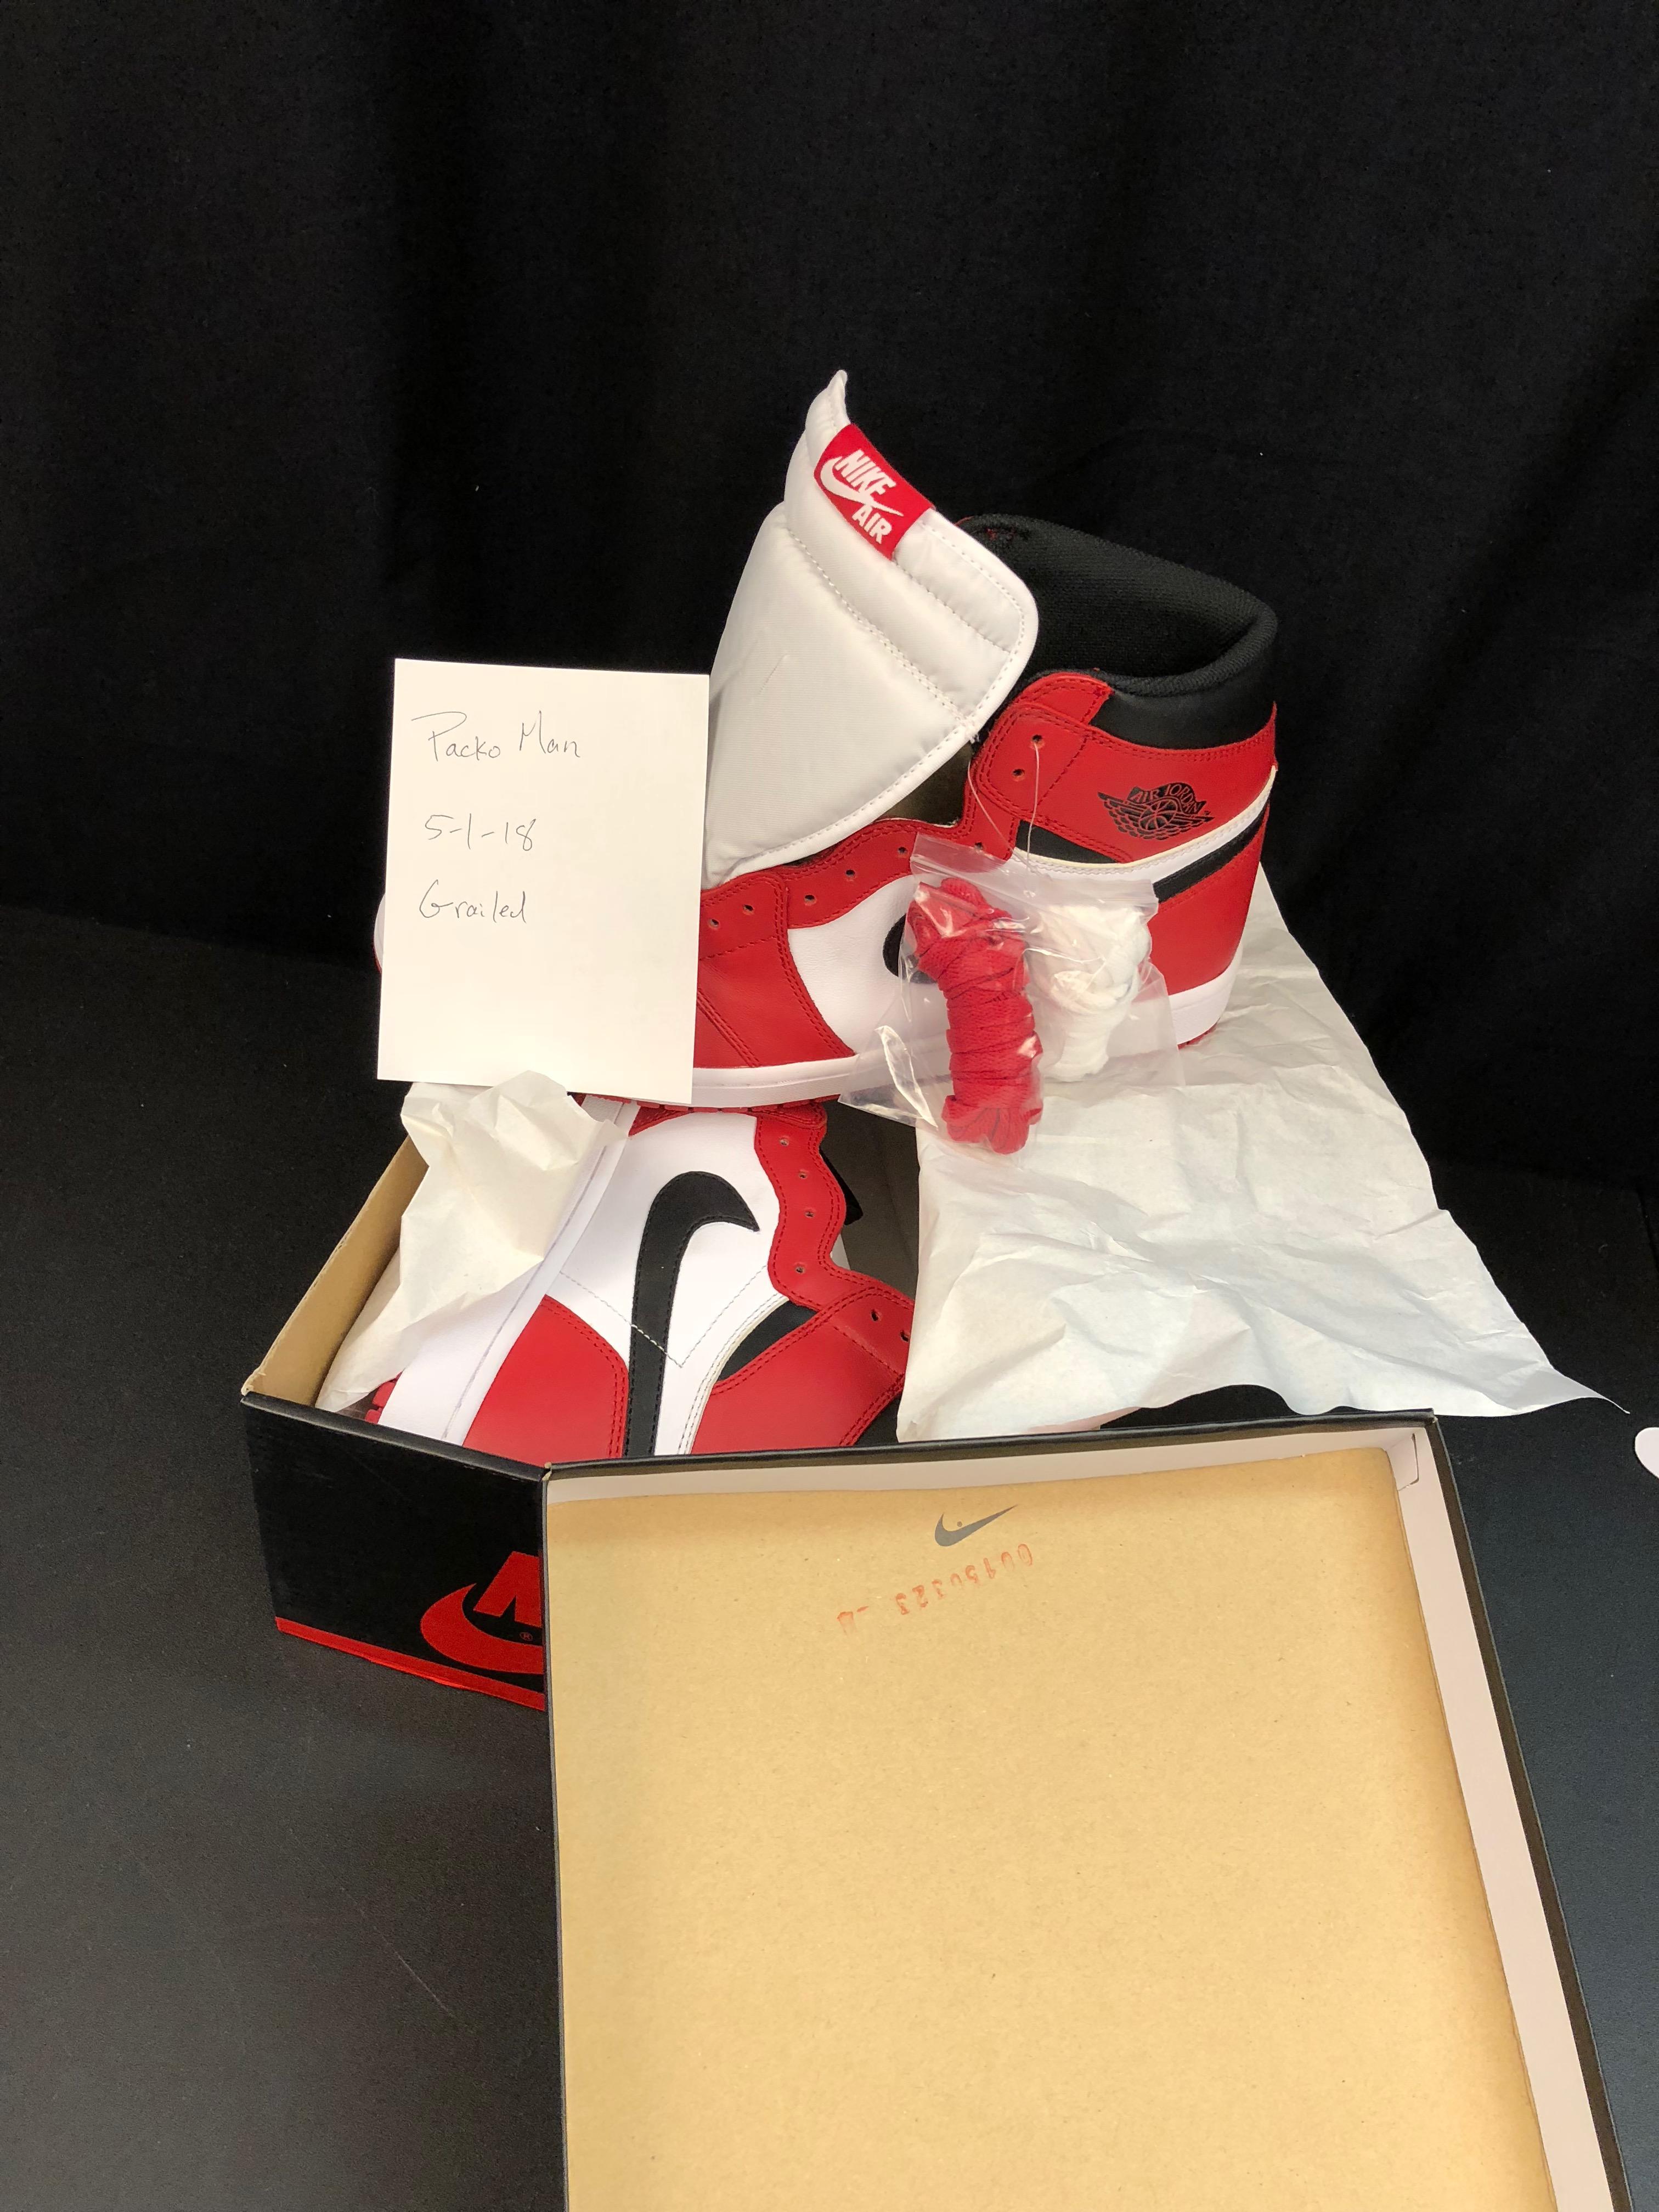 be0afa5f251948 Nike 2015 Air Jordan 1 Retro High Og Chicago Bulls 2015 555088 101 ...